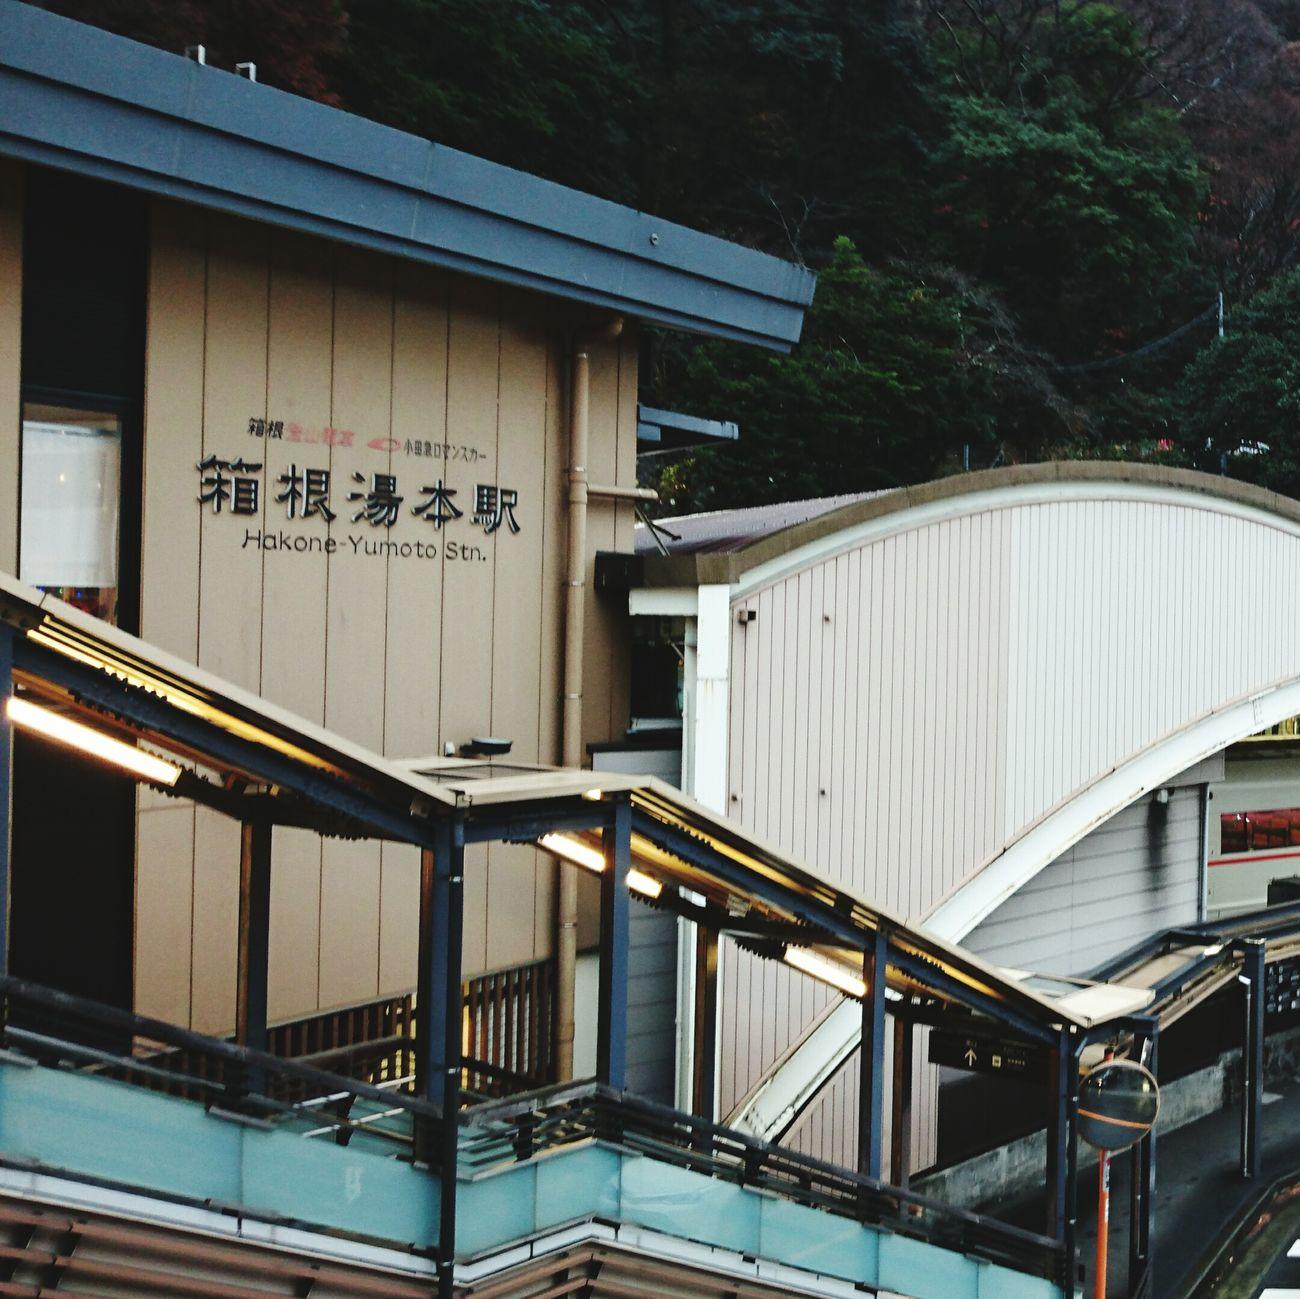 Hakoneyumoto Hakone-yumoto はこね 箱根 箱根湯本 Hakone Japan HAKONE!! Hakone-JP Hakone